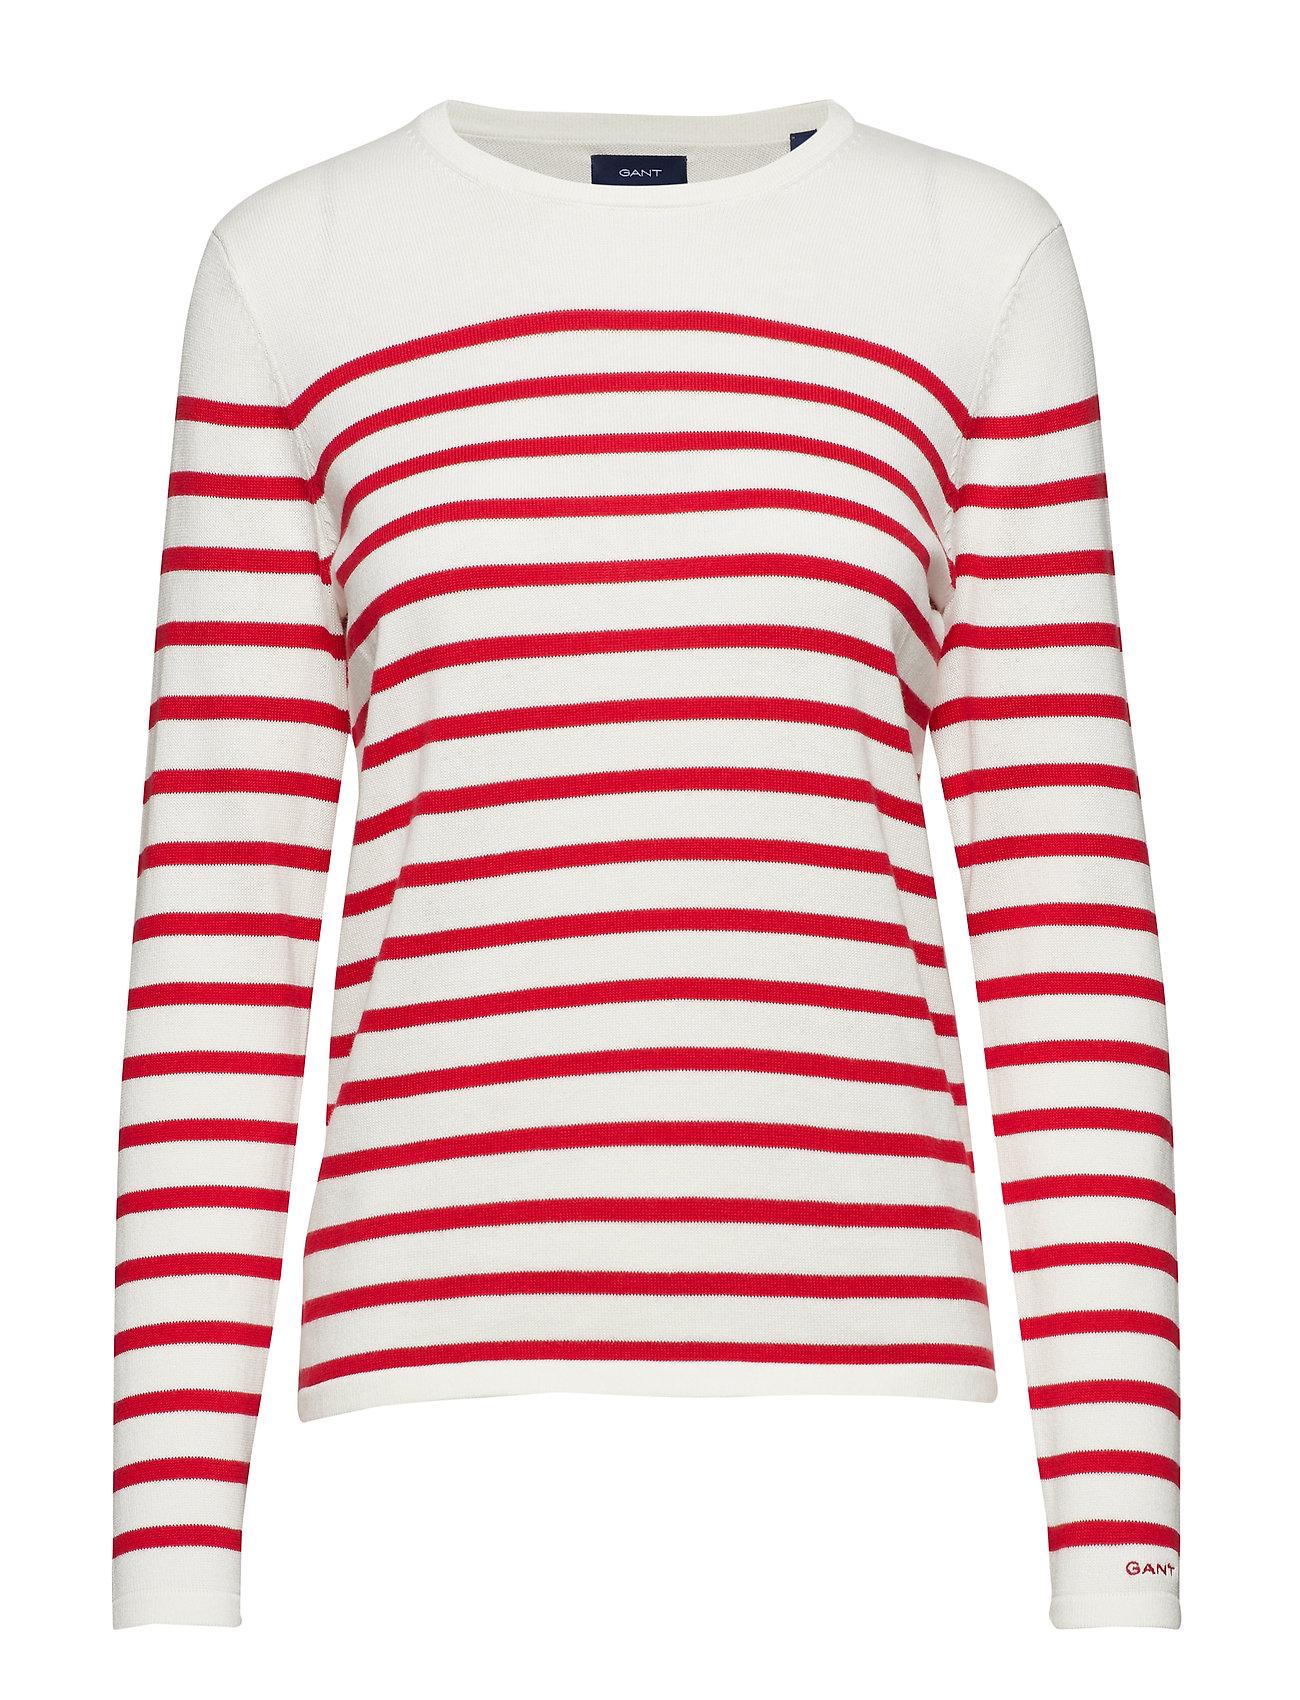 Stripe Stripe CrewredGant CrewredGant Breton Breton Breton Stripe CrewredGant Breton CrewredGant Breton Breton Stripe Stripe CrewredGant CrxeodB